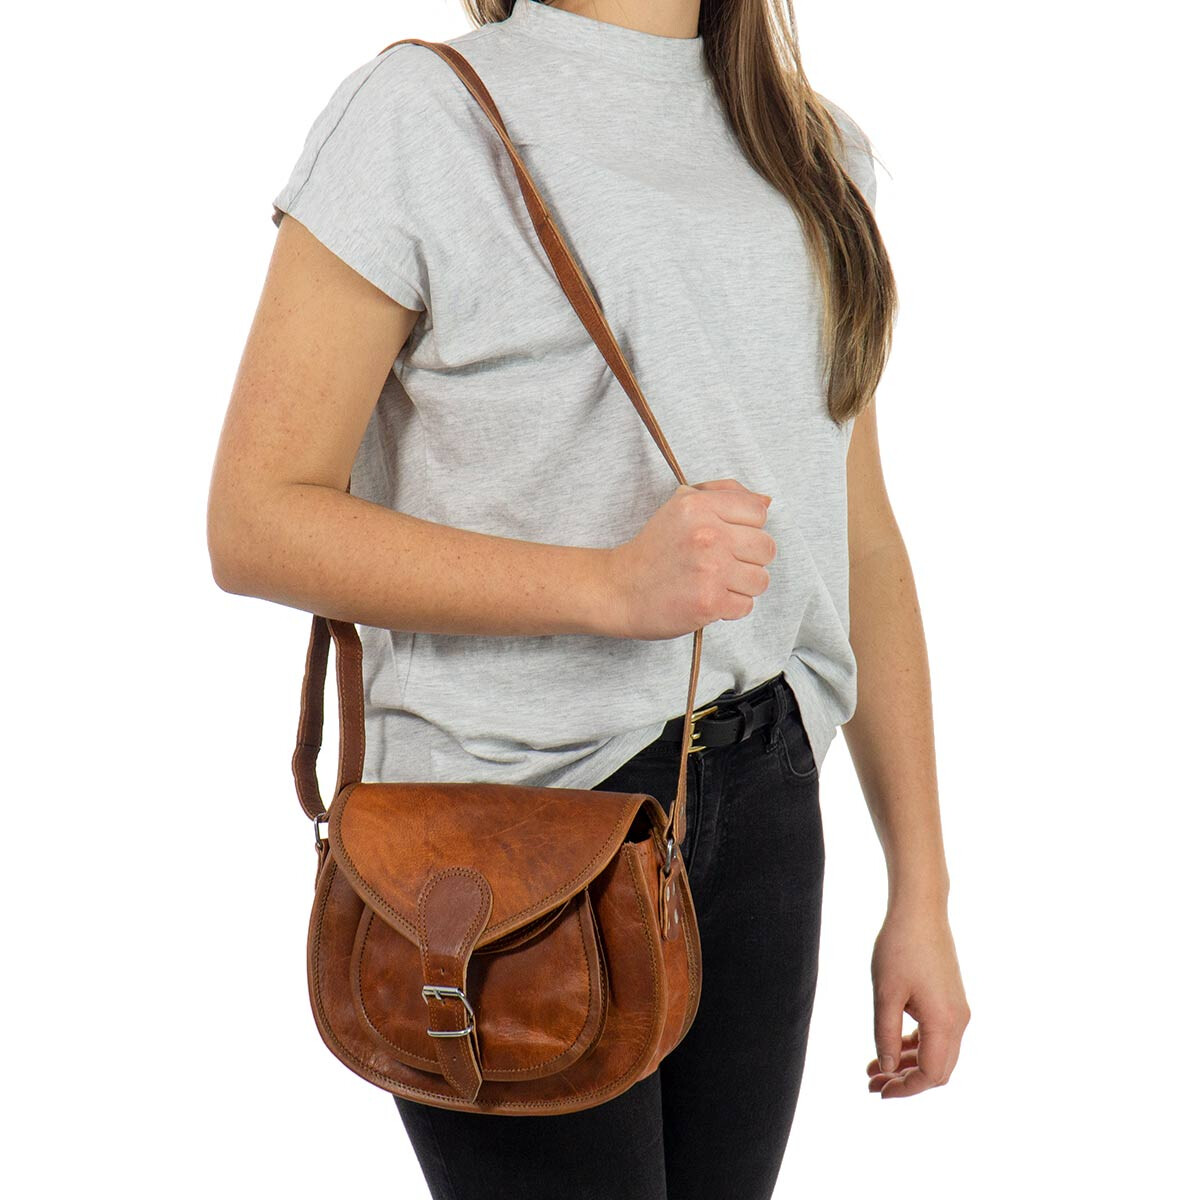 Outlet Umhängetasche – Leder leicht fettig - kleinere Lederfehler - leichter Rost - defekter Verschl